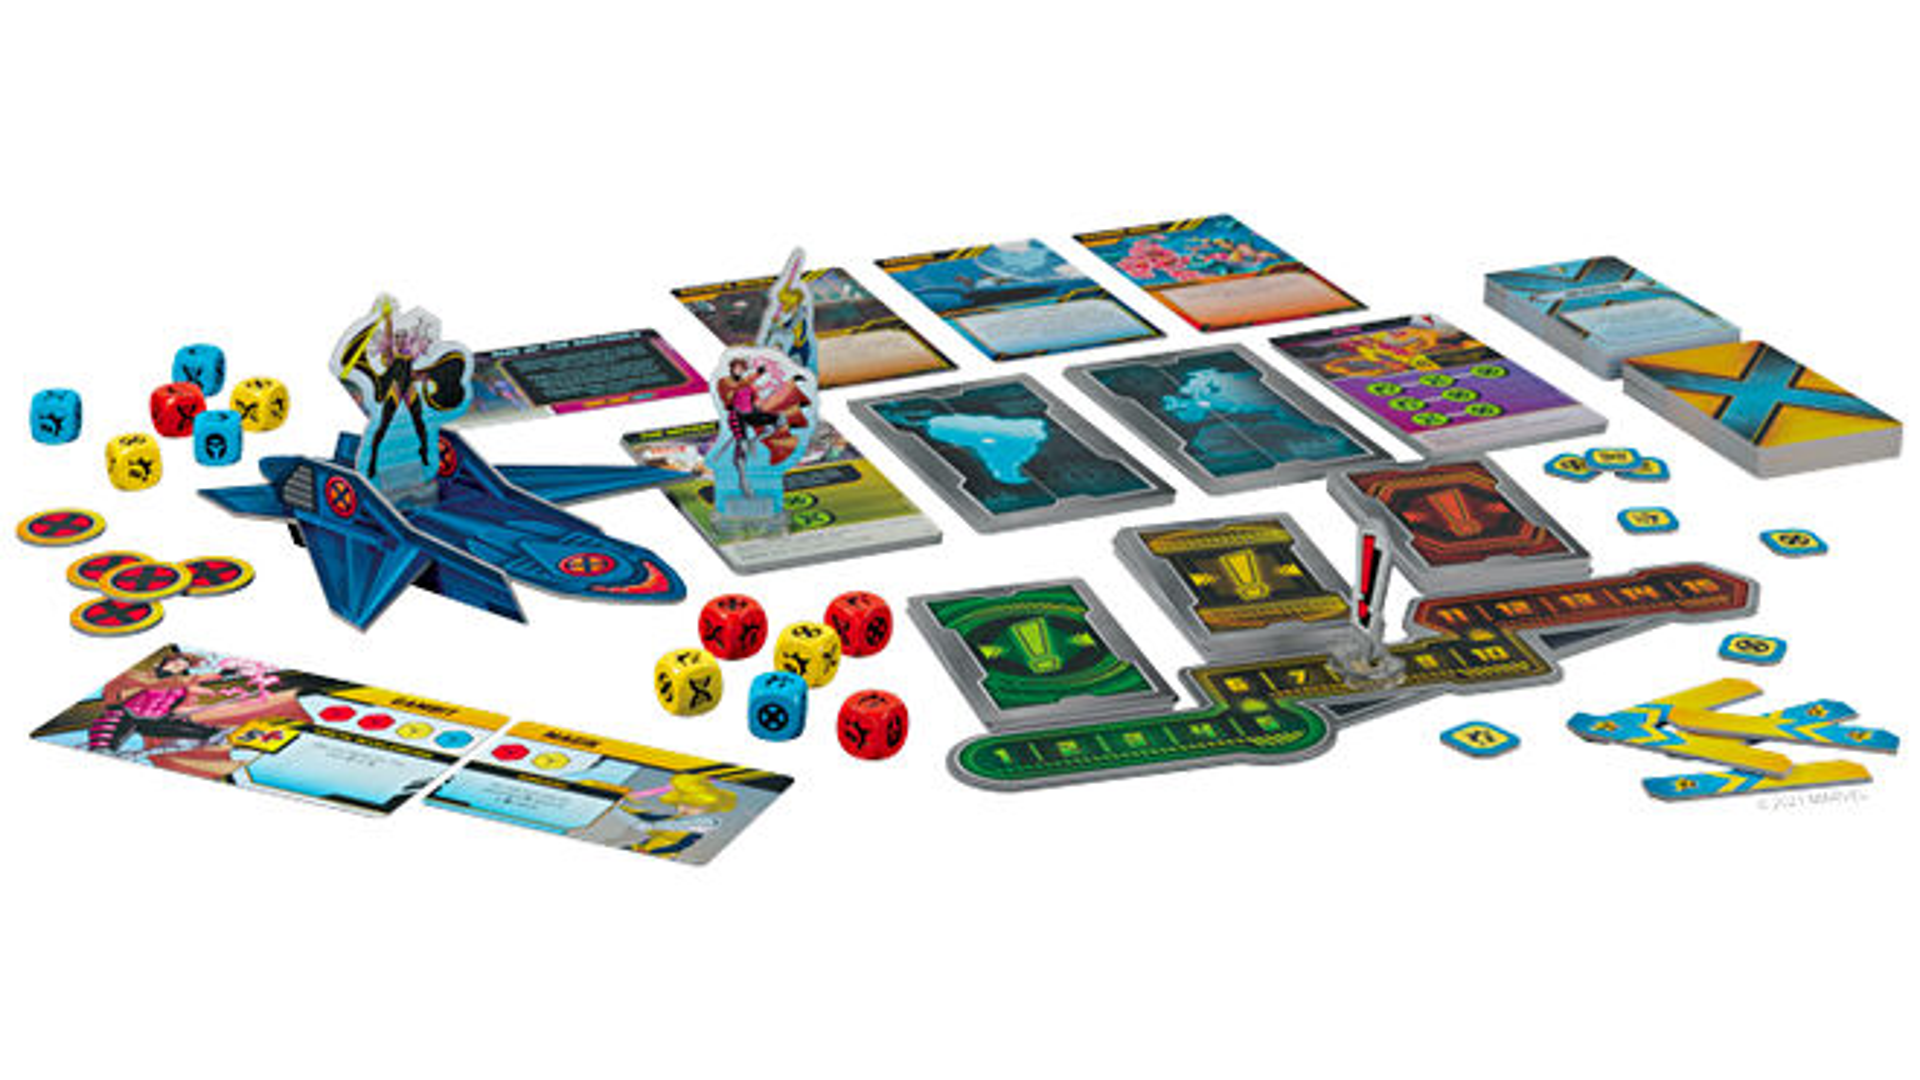 x-men-mutant-insurrection-board-game-gameplay-layout.jpg